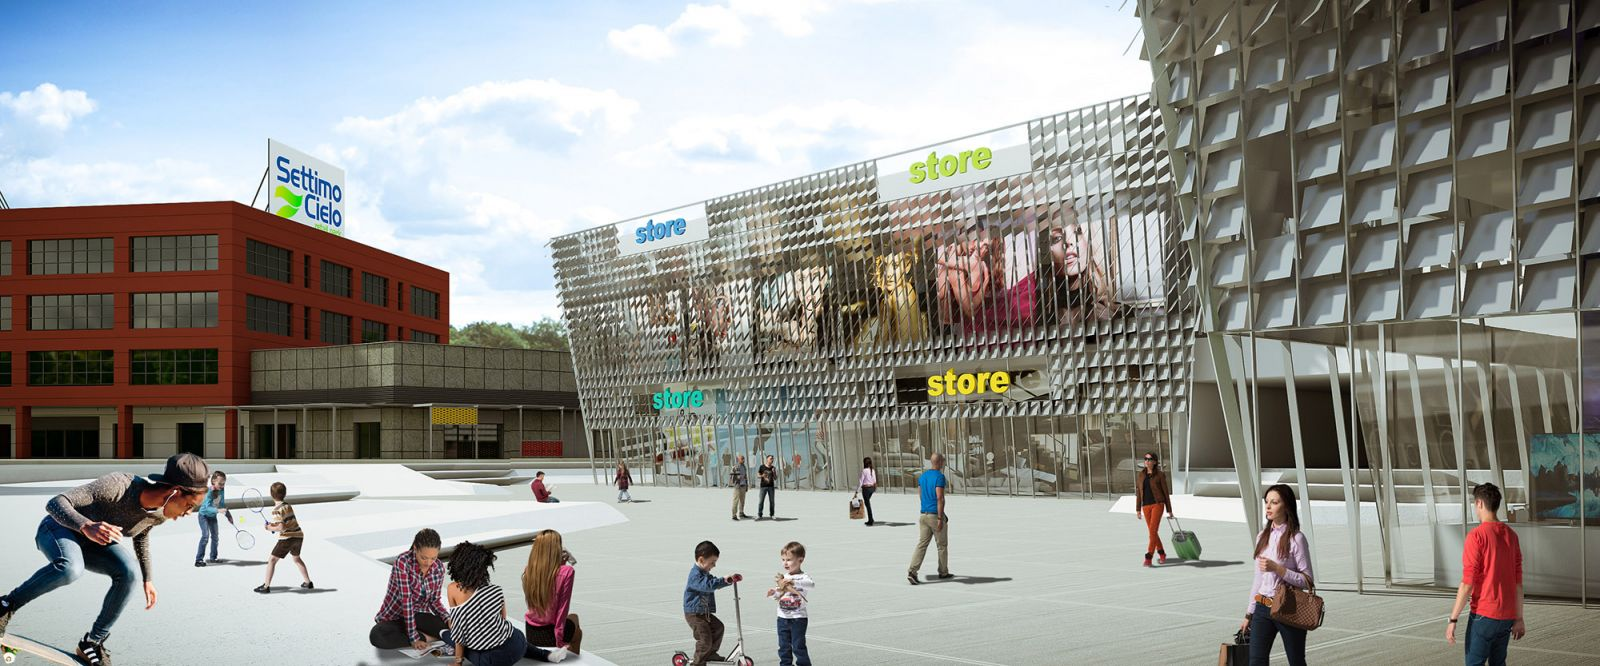 Settimo Cielo Retail Park 391